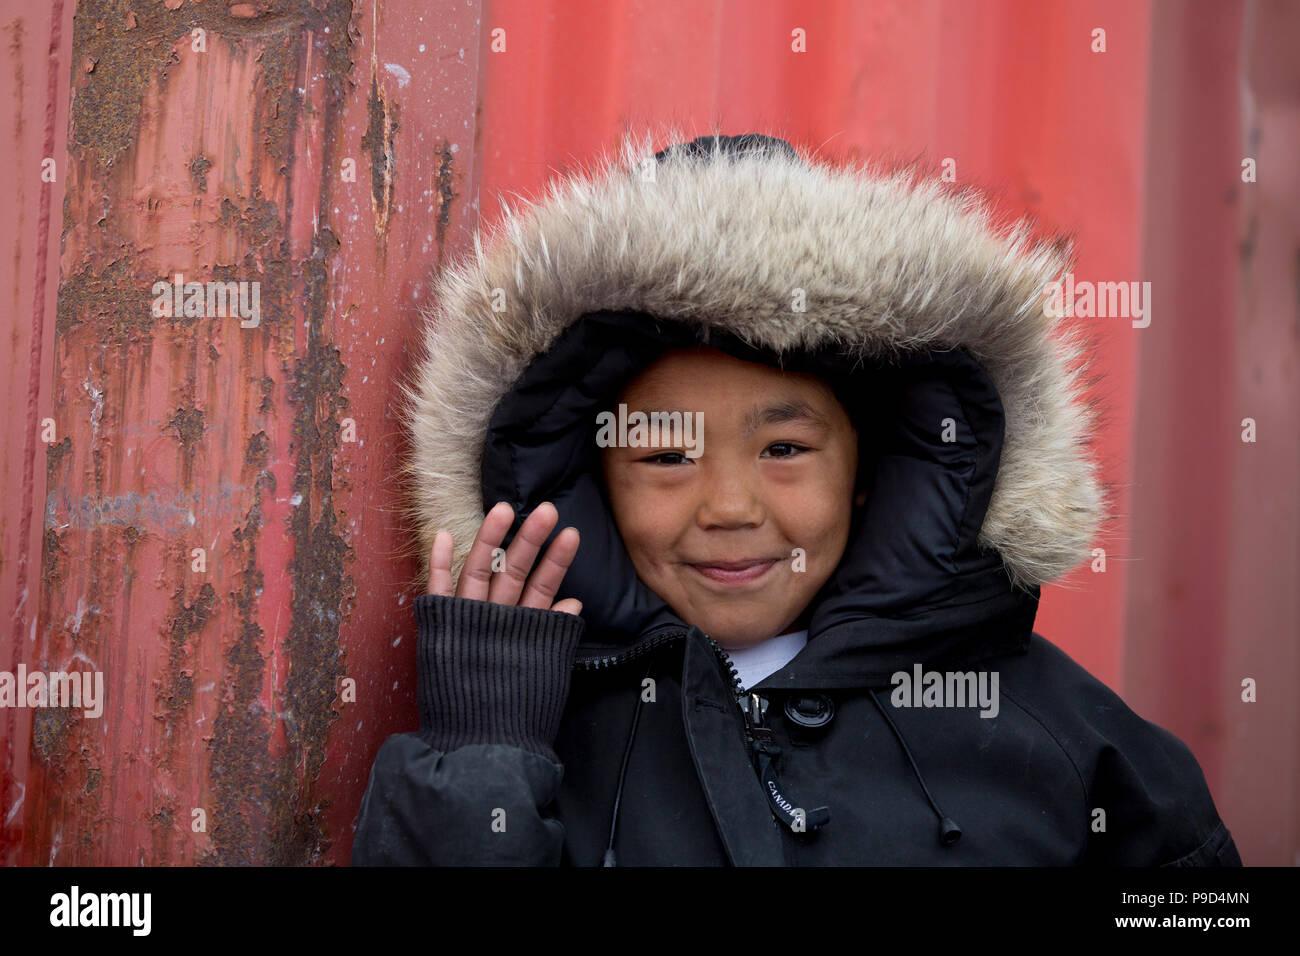 Canada, Nunavut, western shore of Hudson Bay, Kivalliq Region, Arviat. Young boy waving. Stock Photo